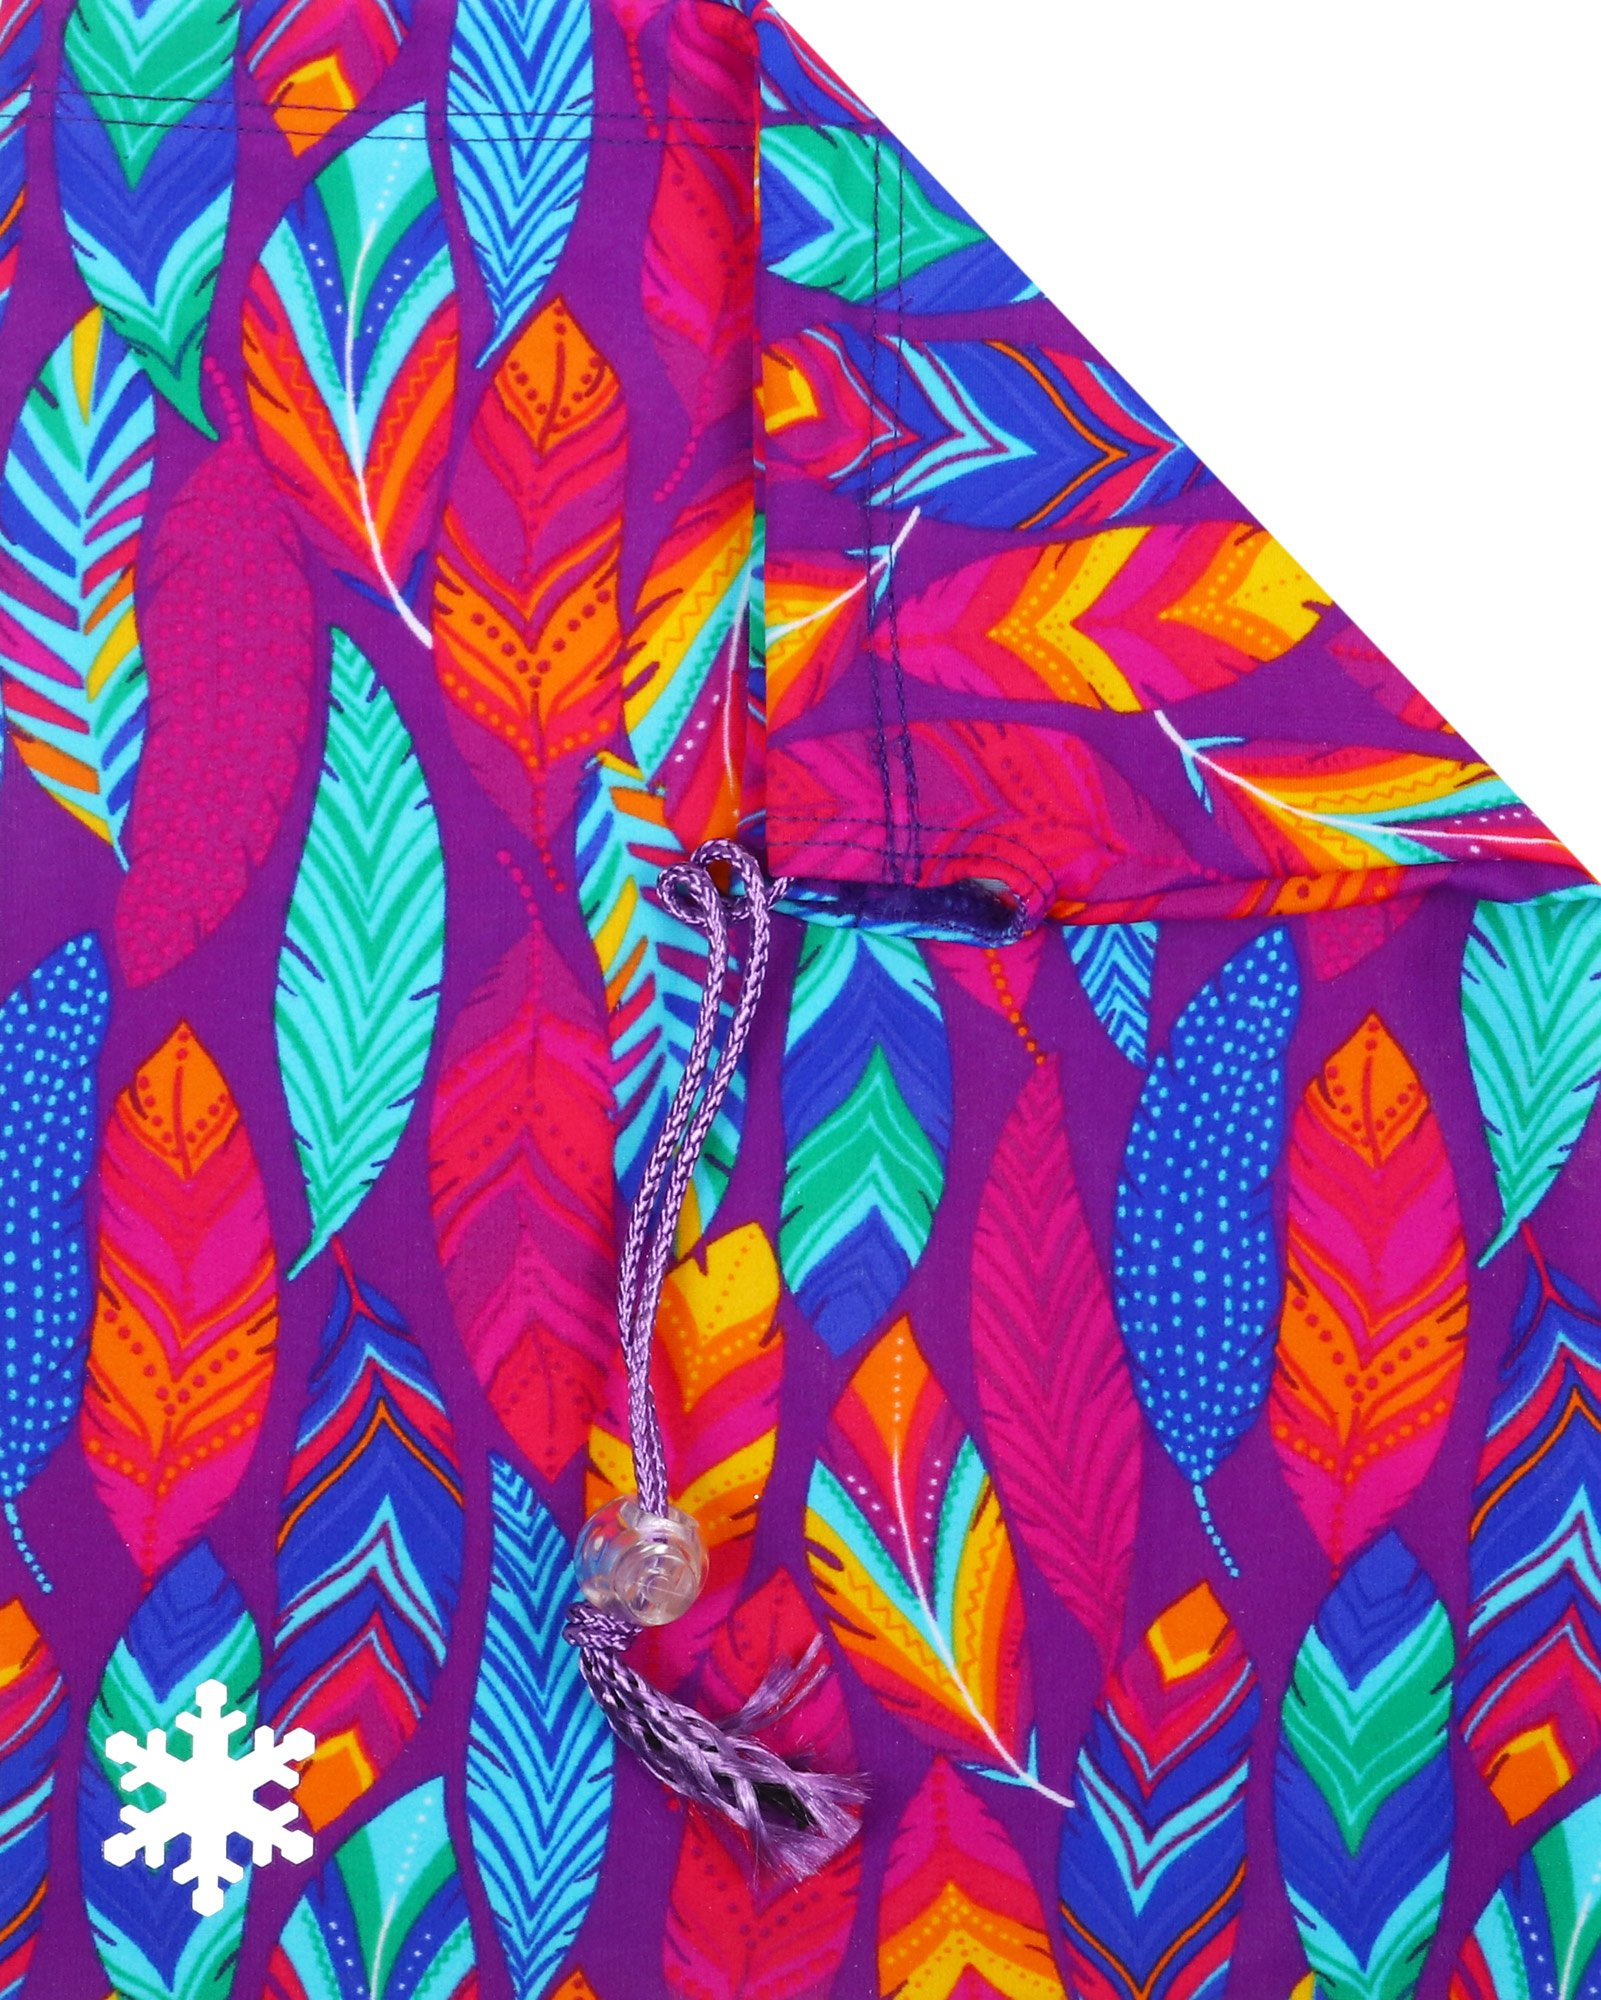 Snowflake Designs Feathery Fun Gymnastics Grip Bag